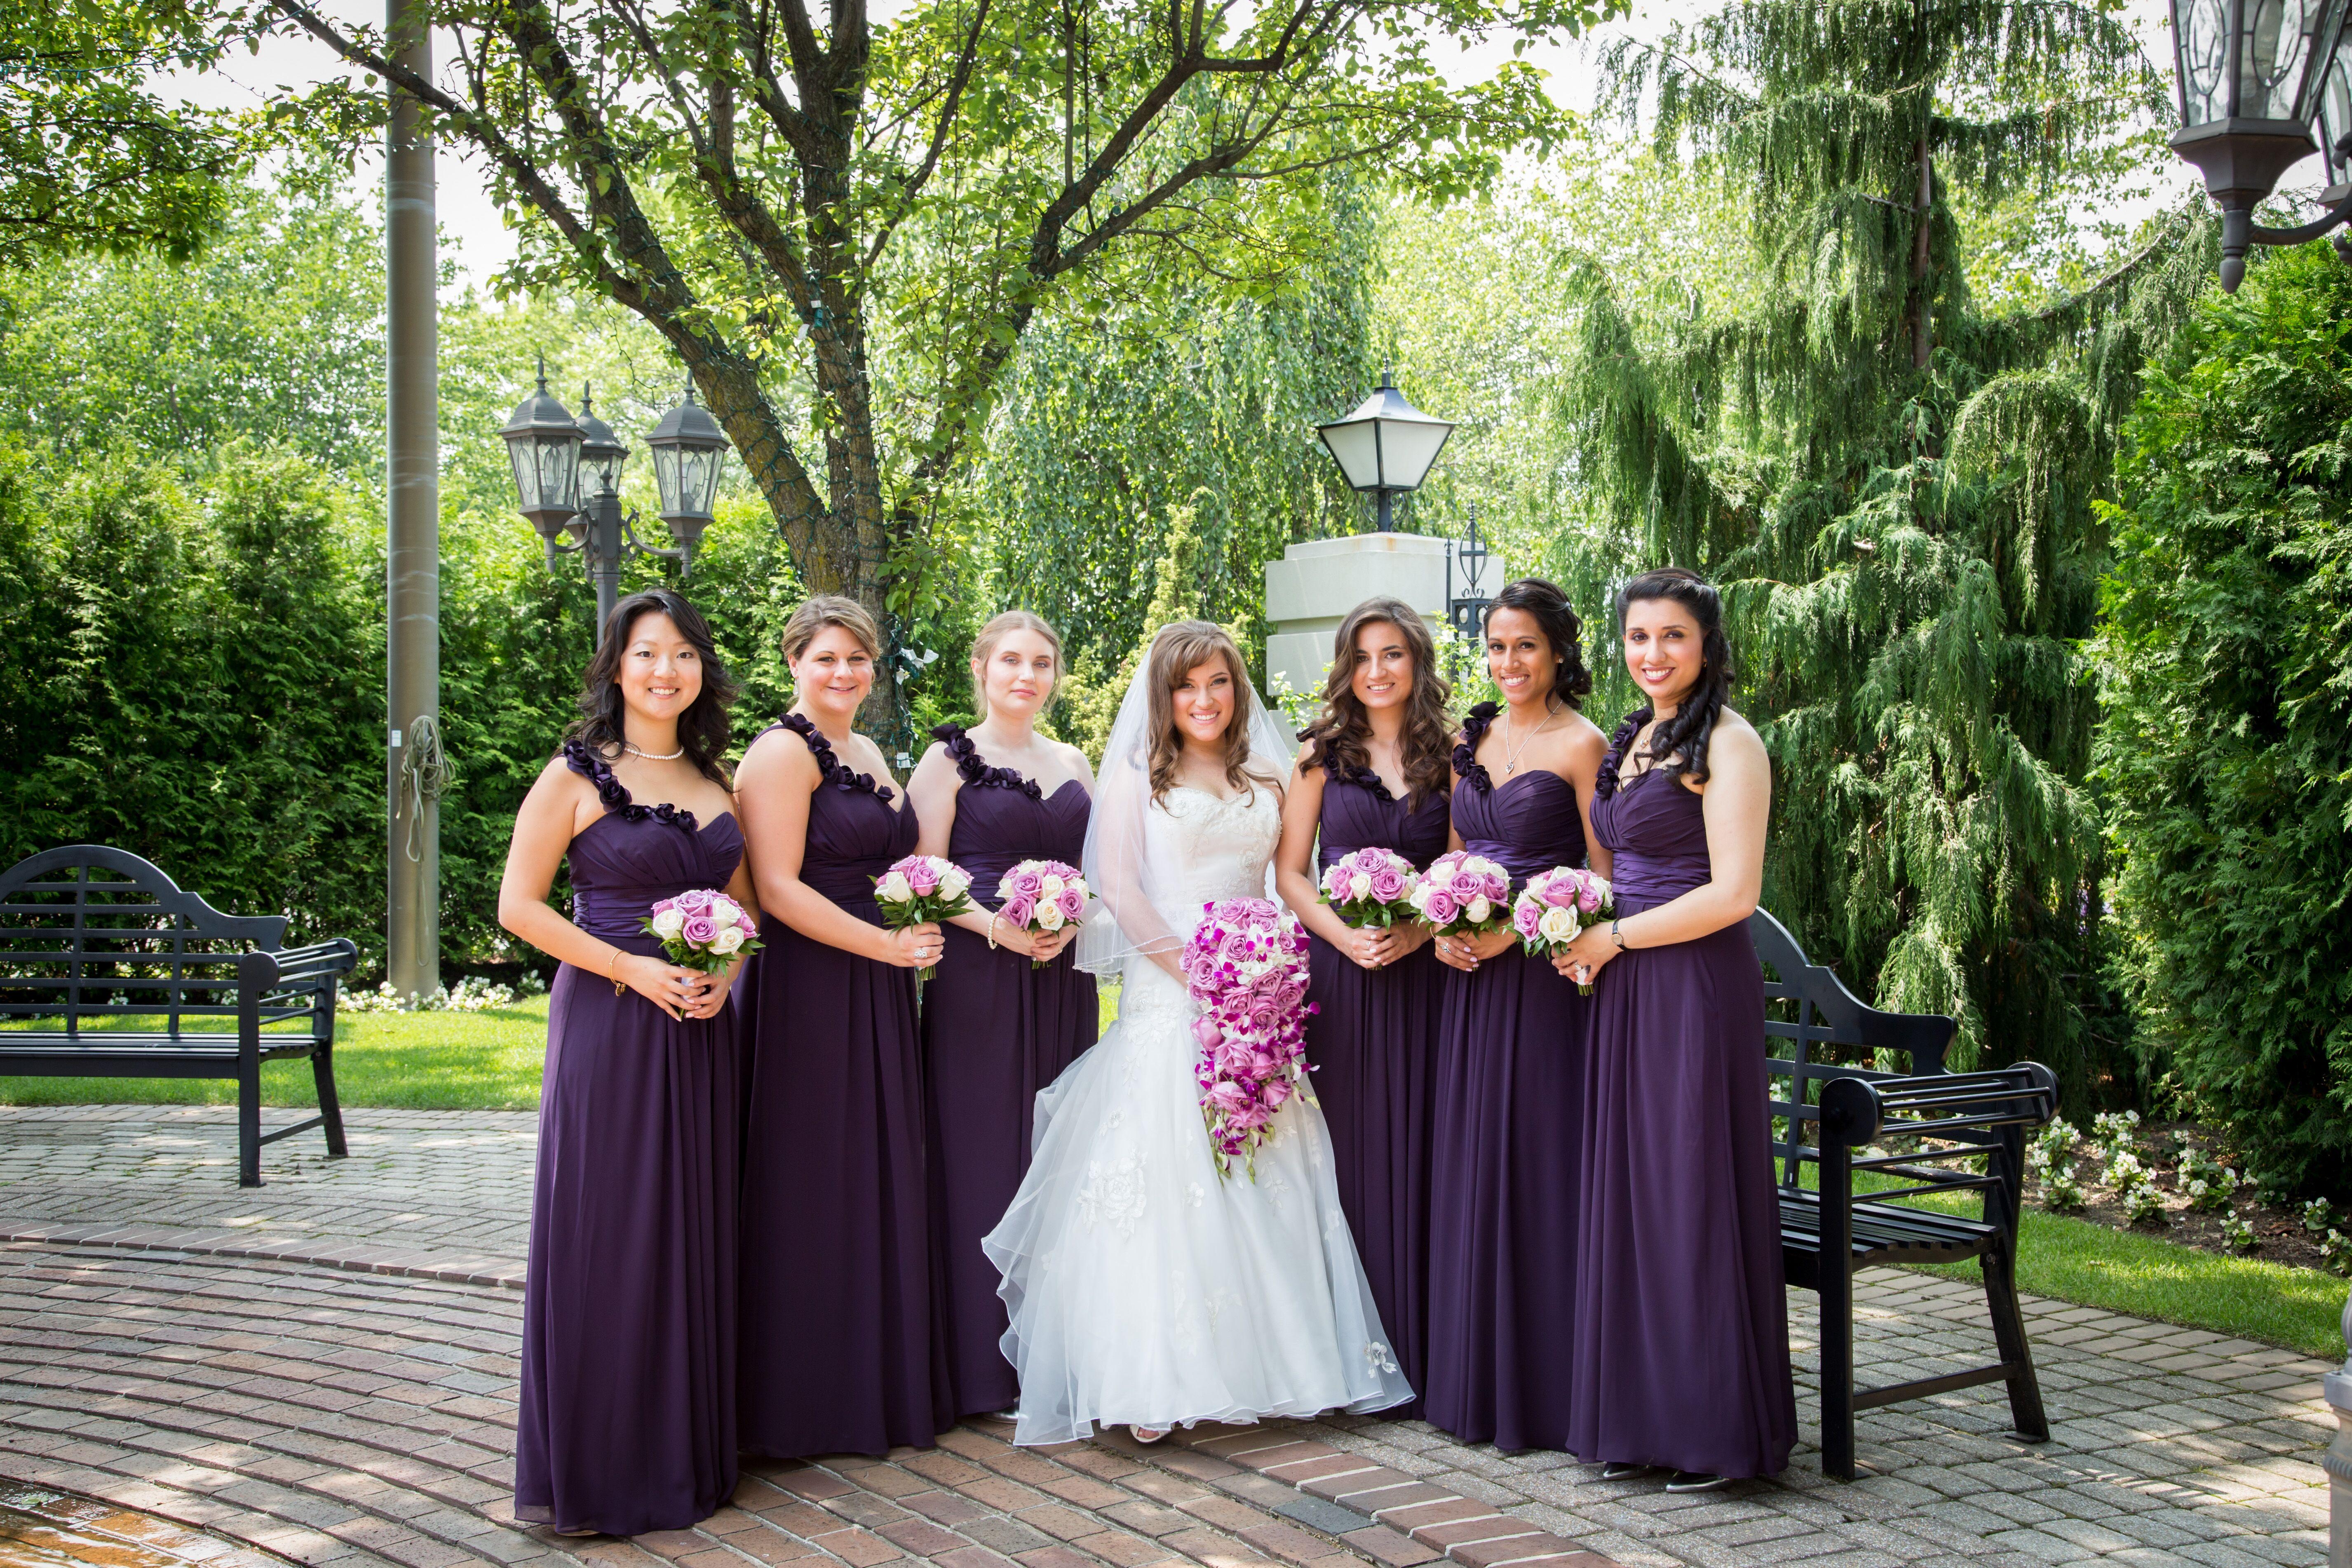 lilac bridesmaid and groom - HD5706×3804